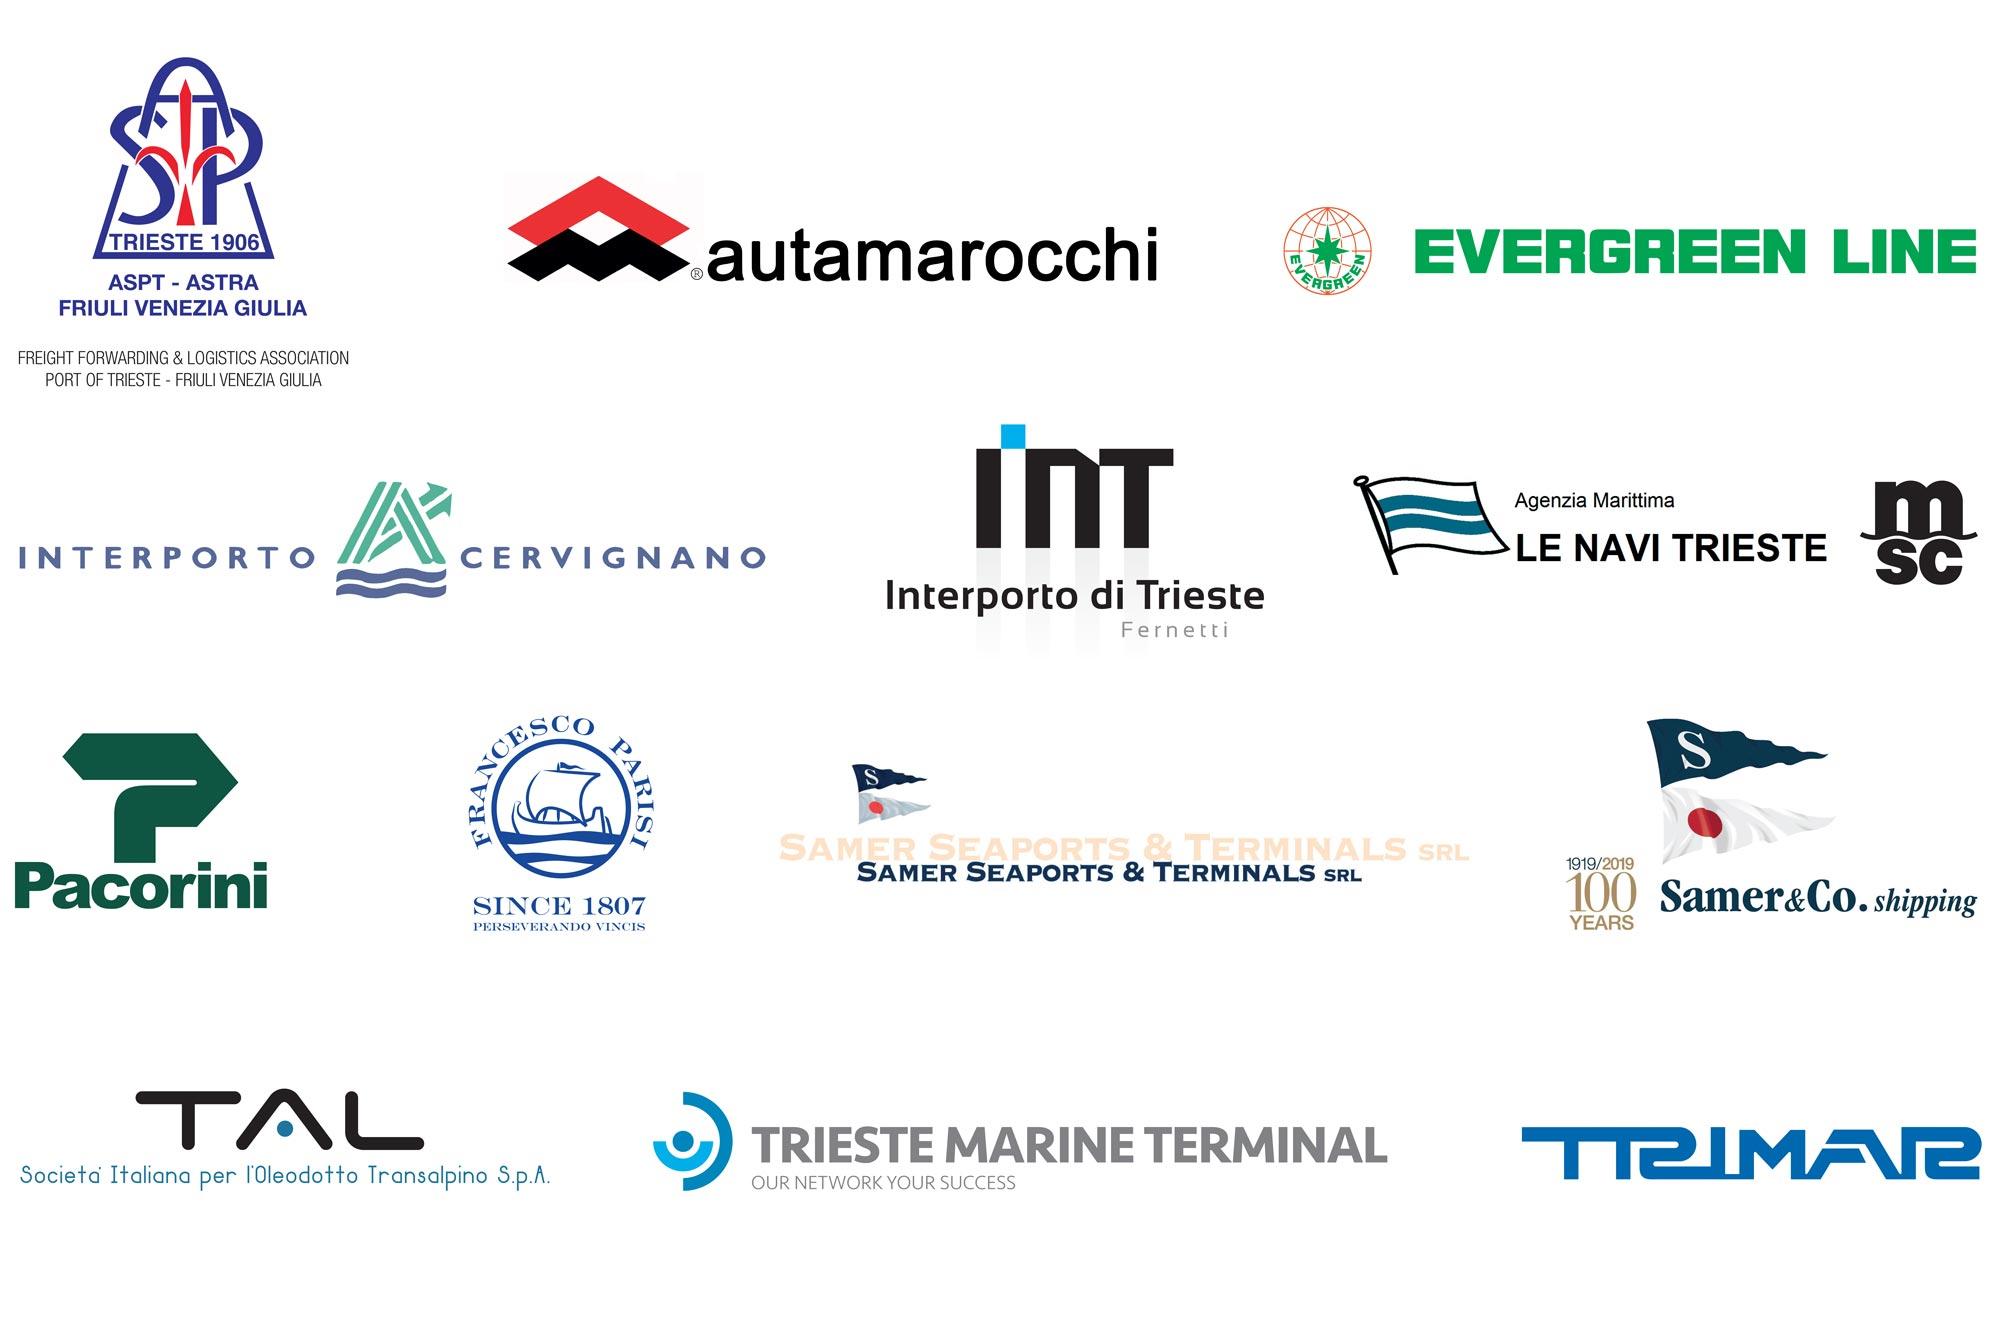 Trieste Port Community Stakeholders and Sponsors